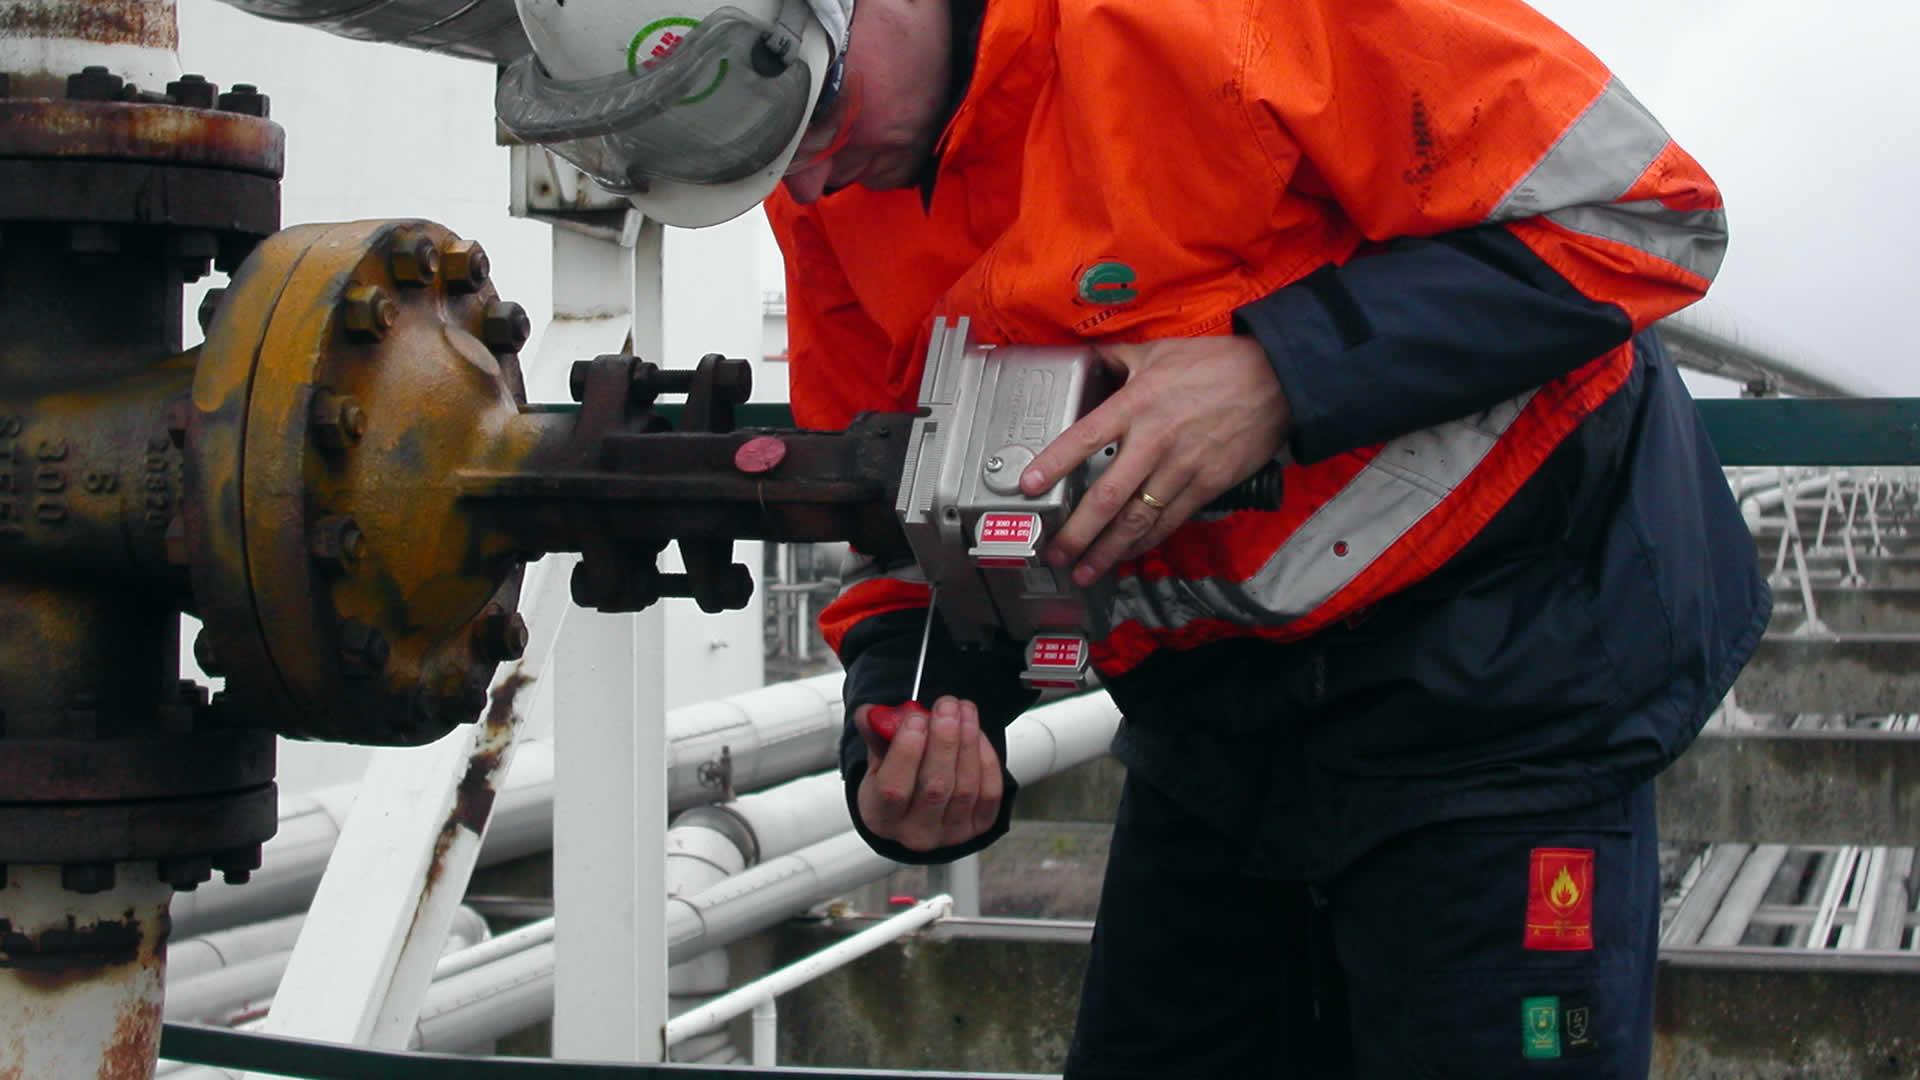 Installation of a valve interlock on a manual valve